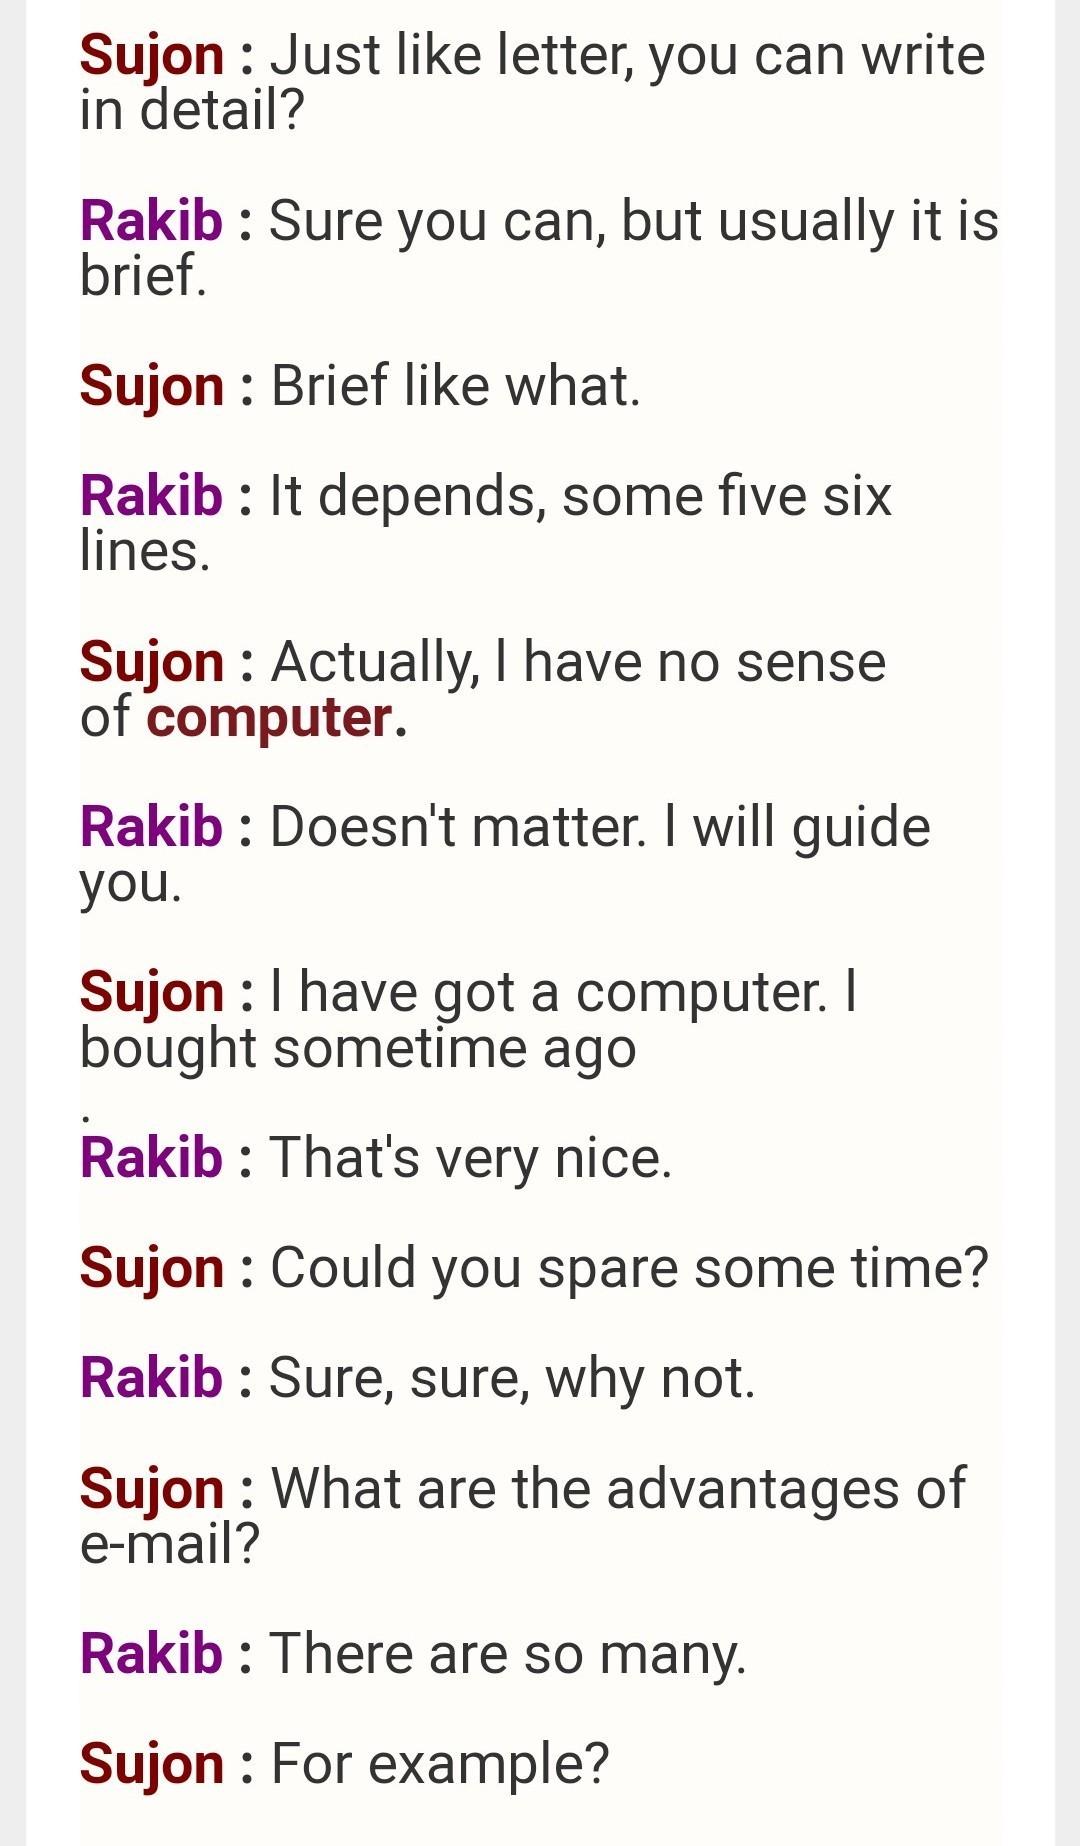 Dialogue Between Two Frnds Having Conversation Reguesting